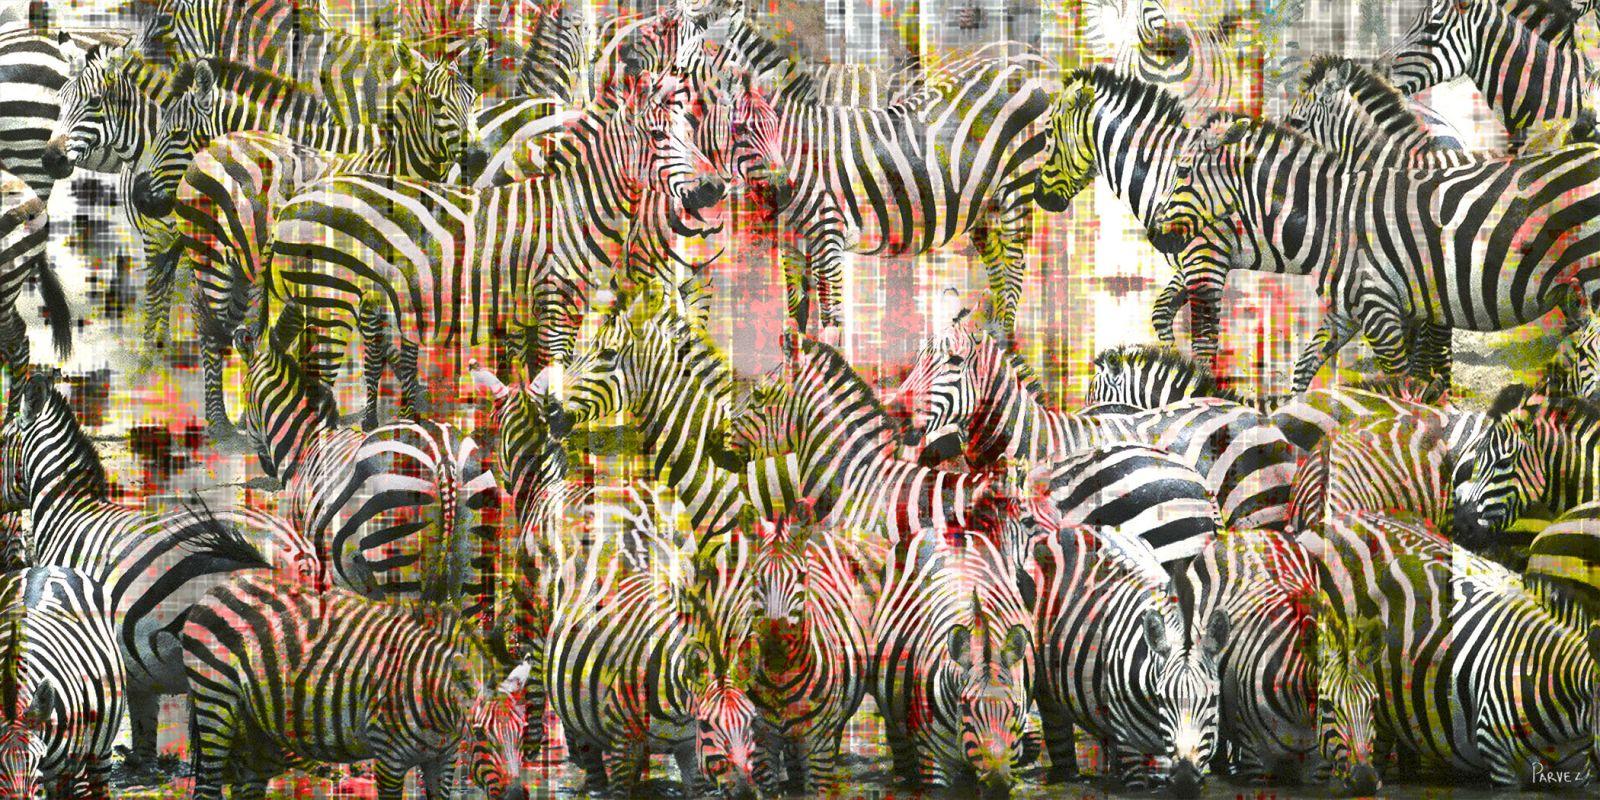 Parvez Taj Zebras Art Print on Premium Canvas 12 x 24 Home Decor Sale $71.23 ITEM: bci2686798 ID#:G47-27-C-24 UPC: 700064368251 :